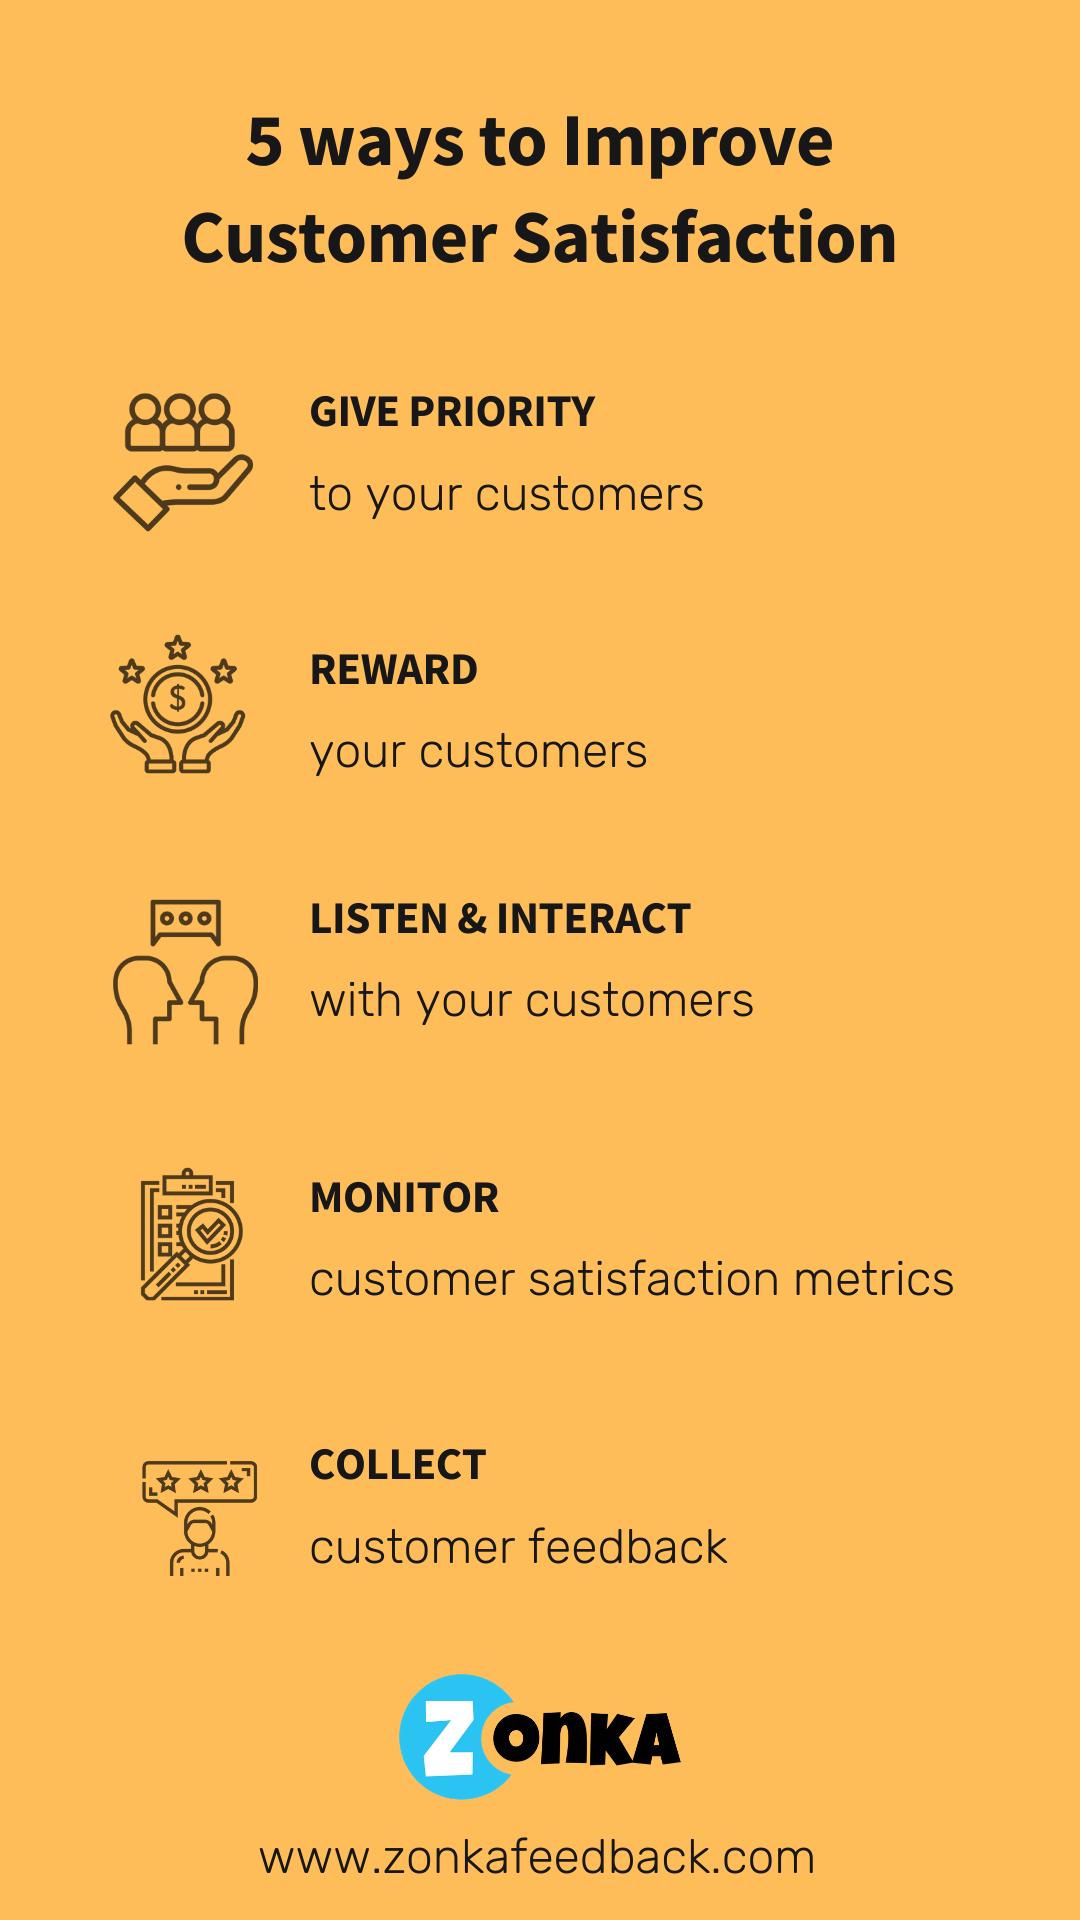 5 Ways to Improve Customer Satisfaction